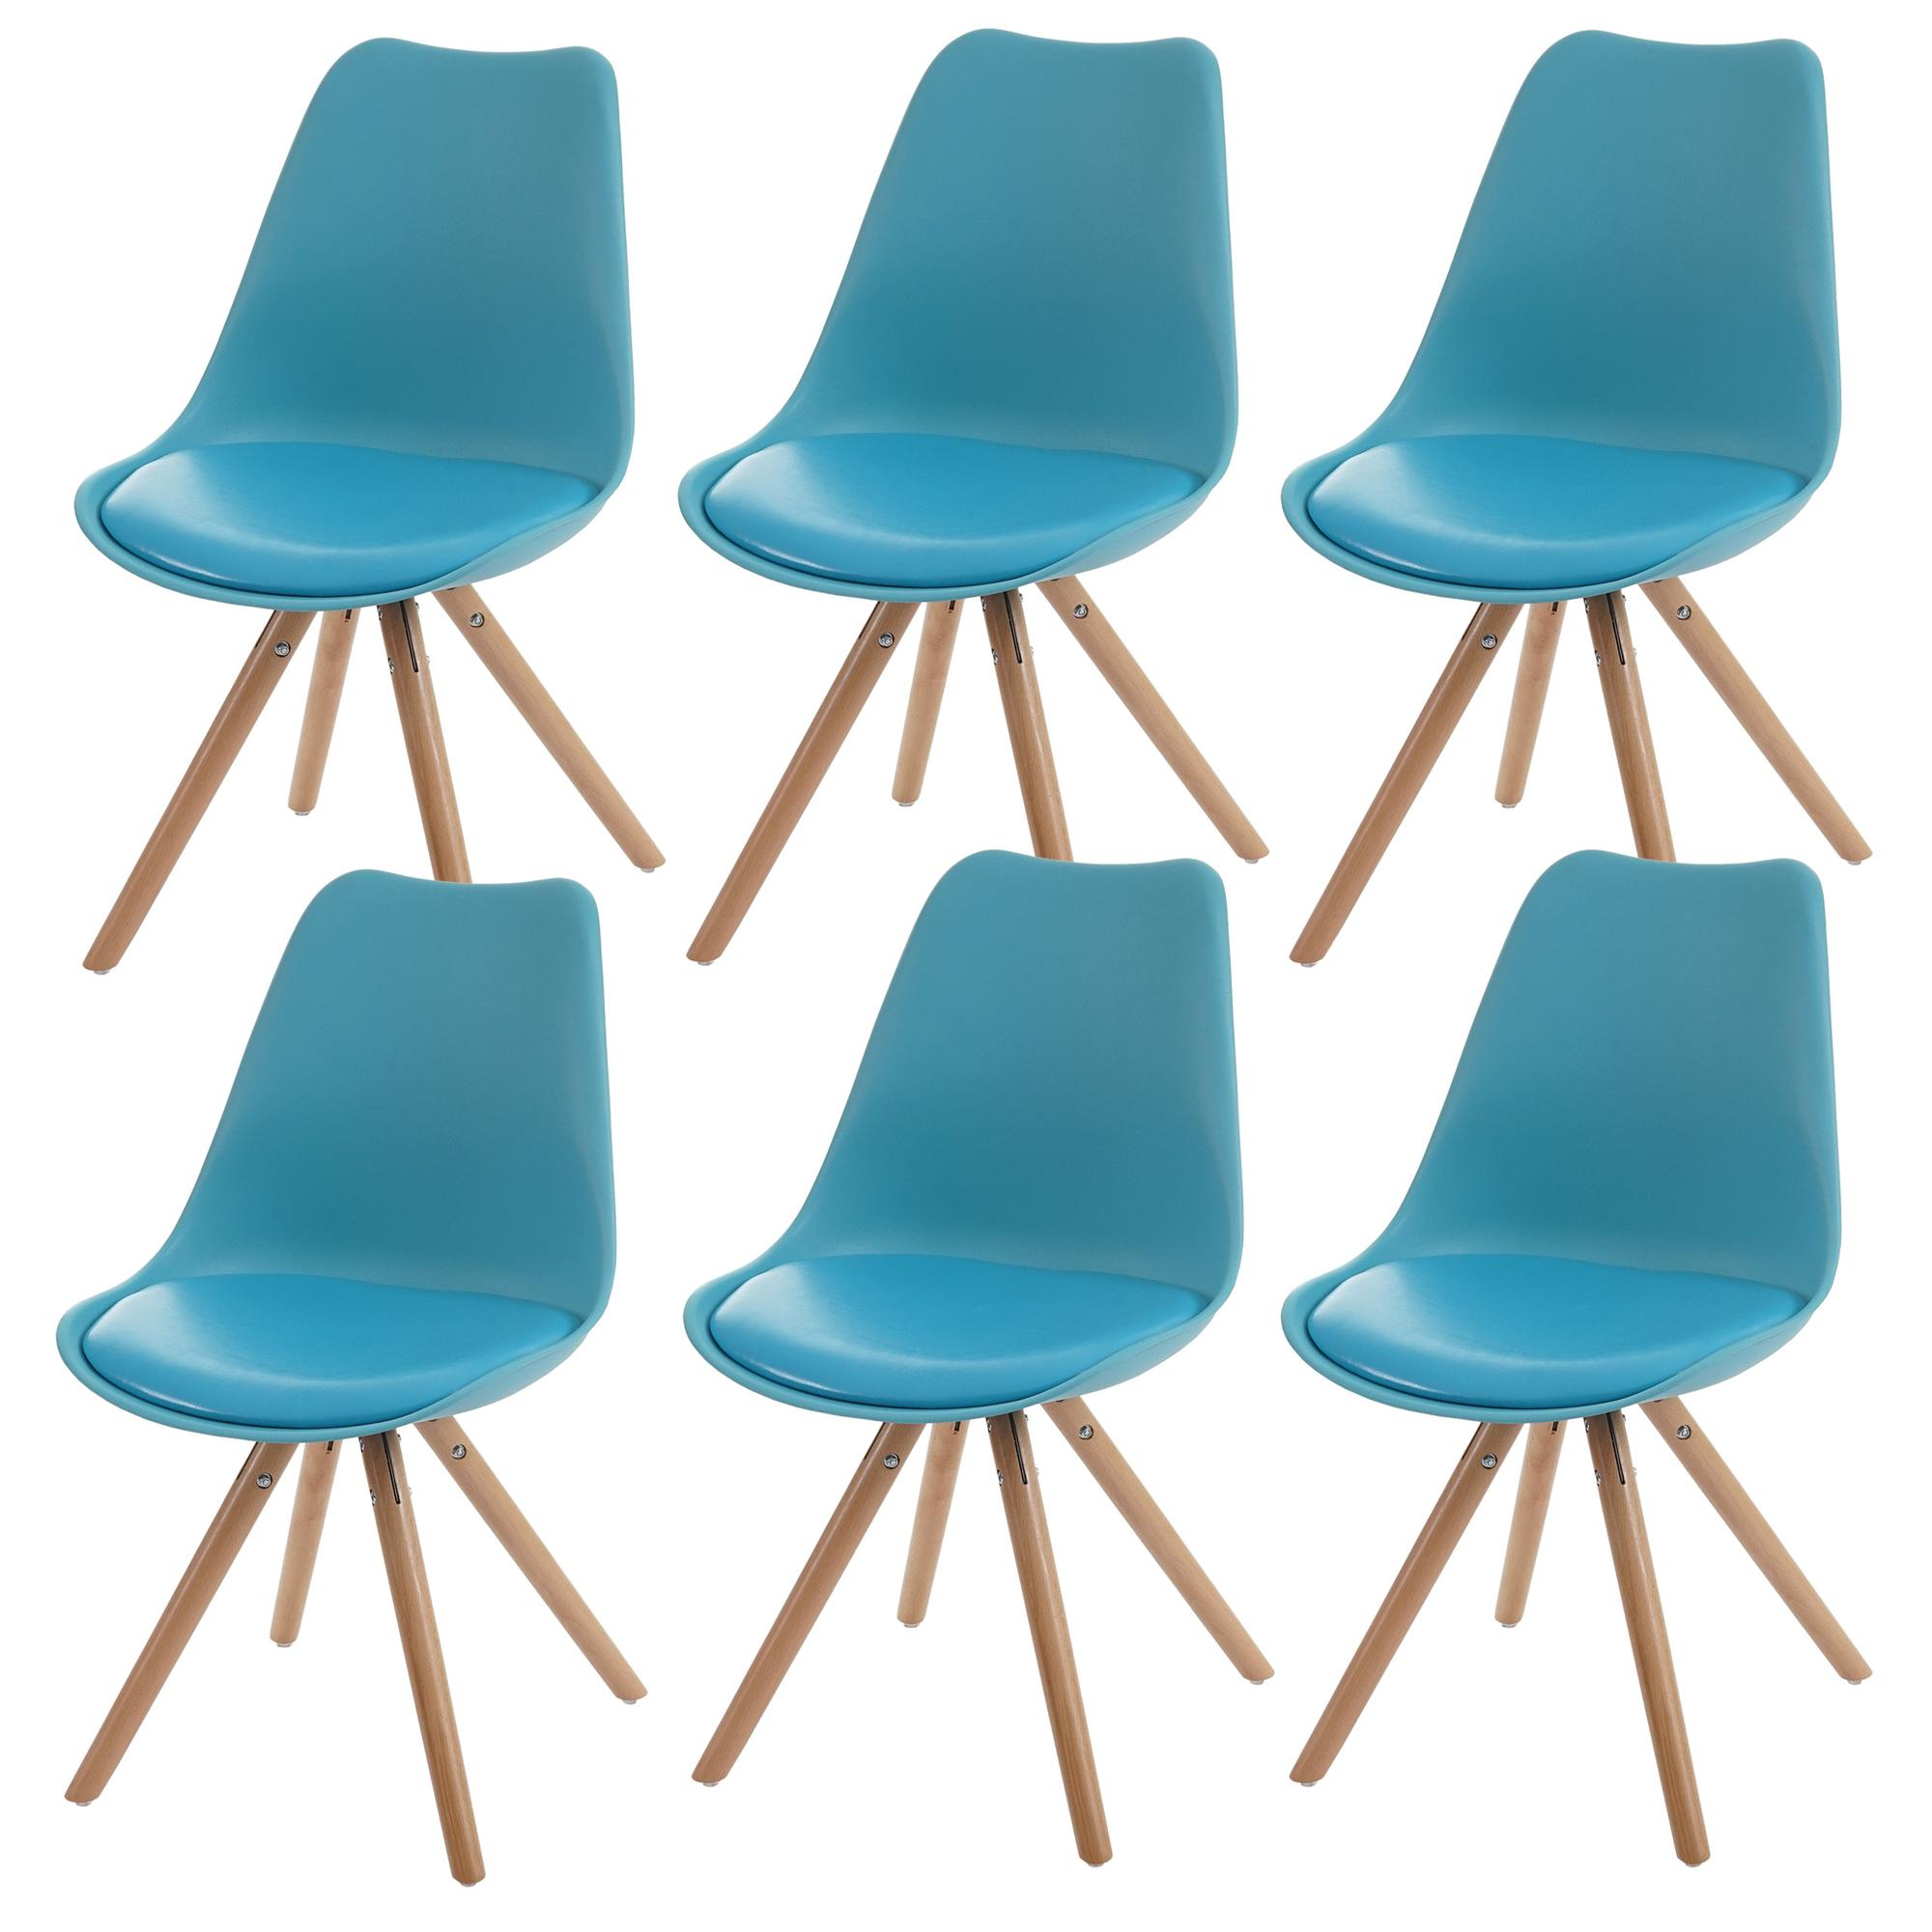 Lote 6 sillas carol en turquesa dise o moderno asiento acolchado lote 6 sillas de dise o - Sillas turquesa ...